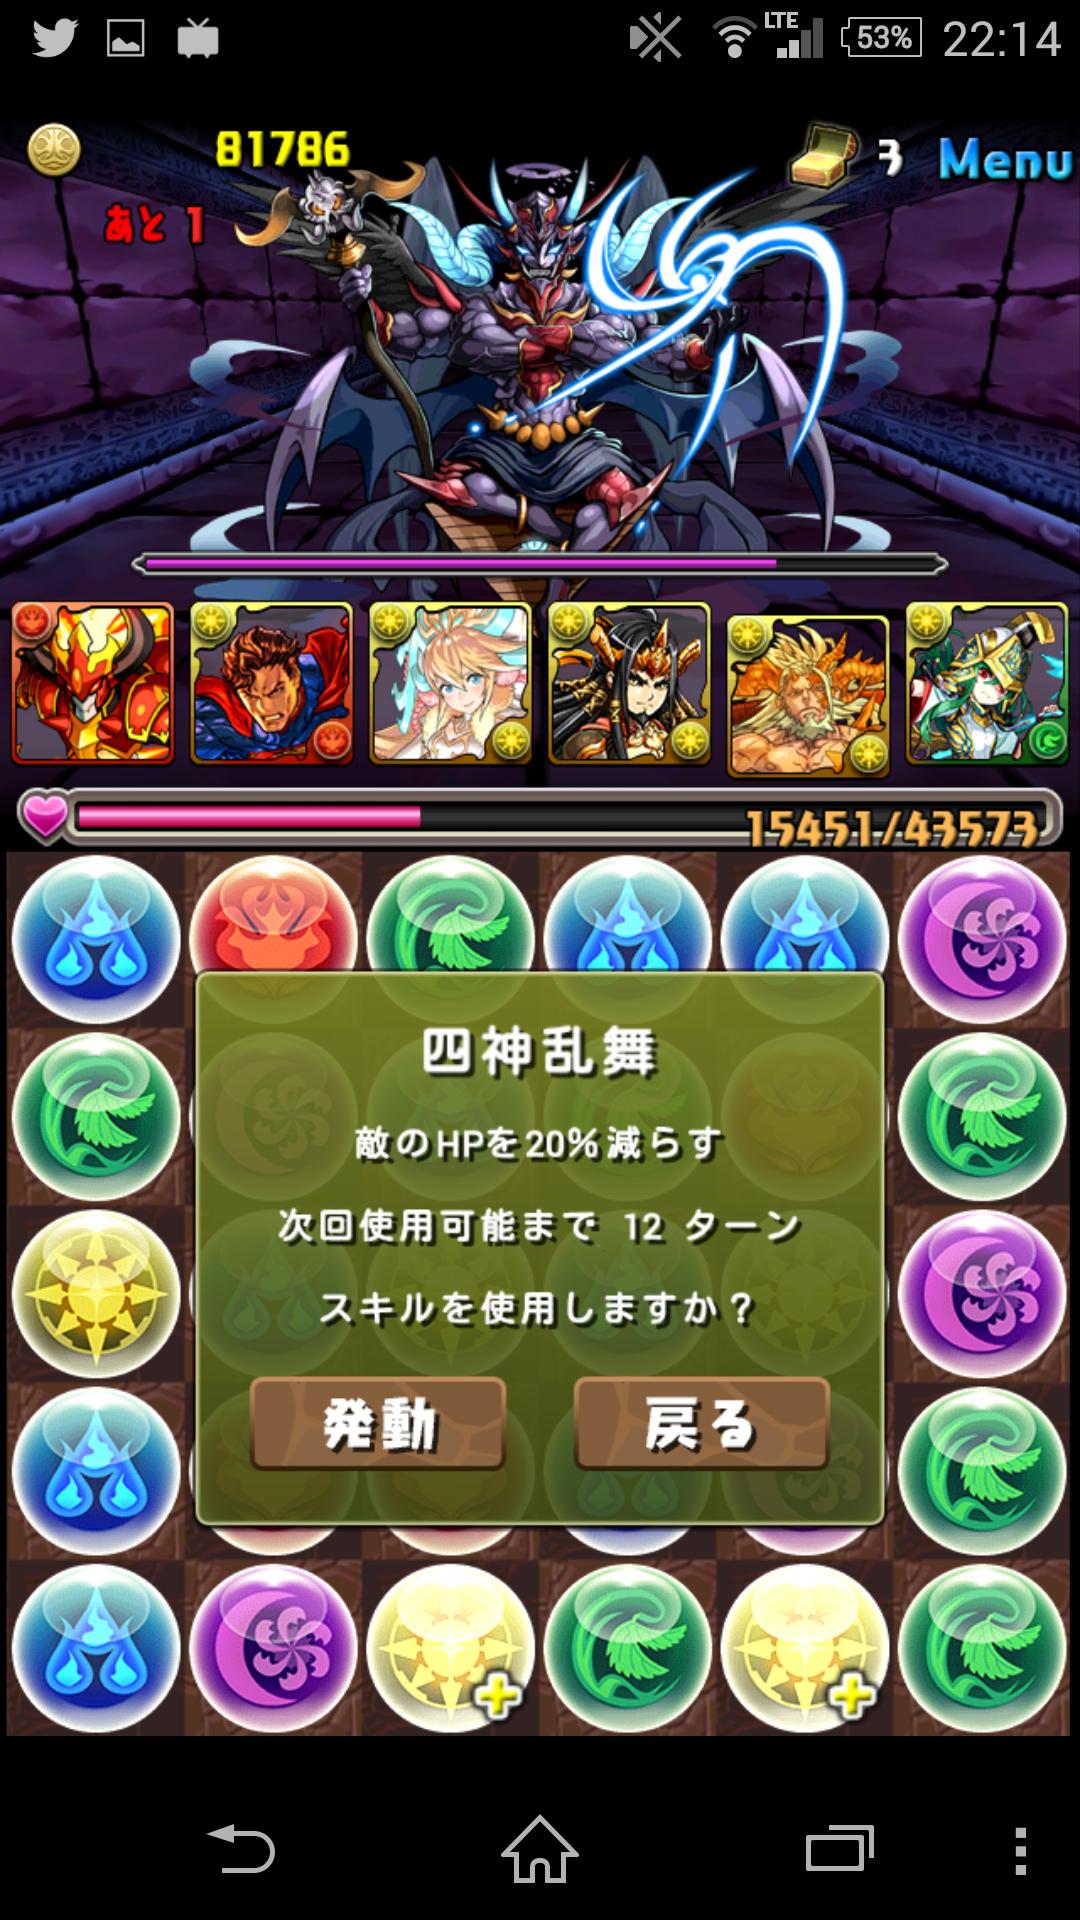 Screenshot_2015-01-24-22-14-47.png